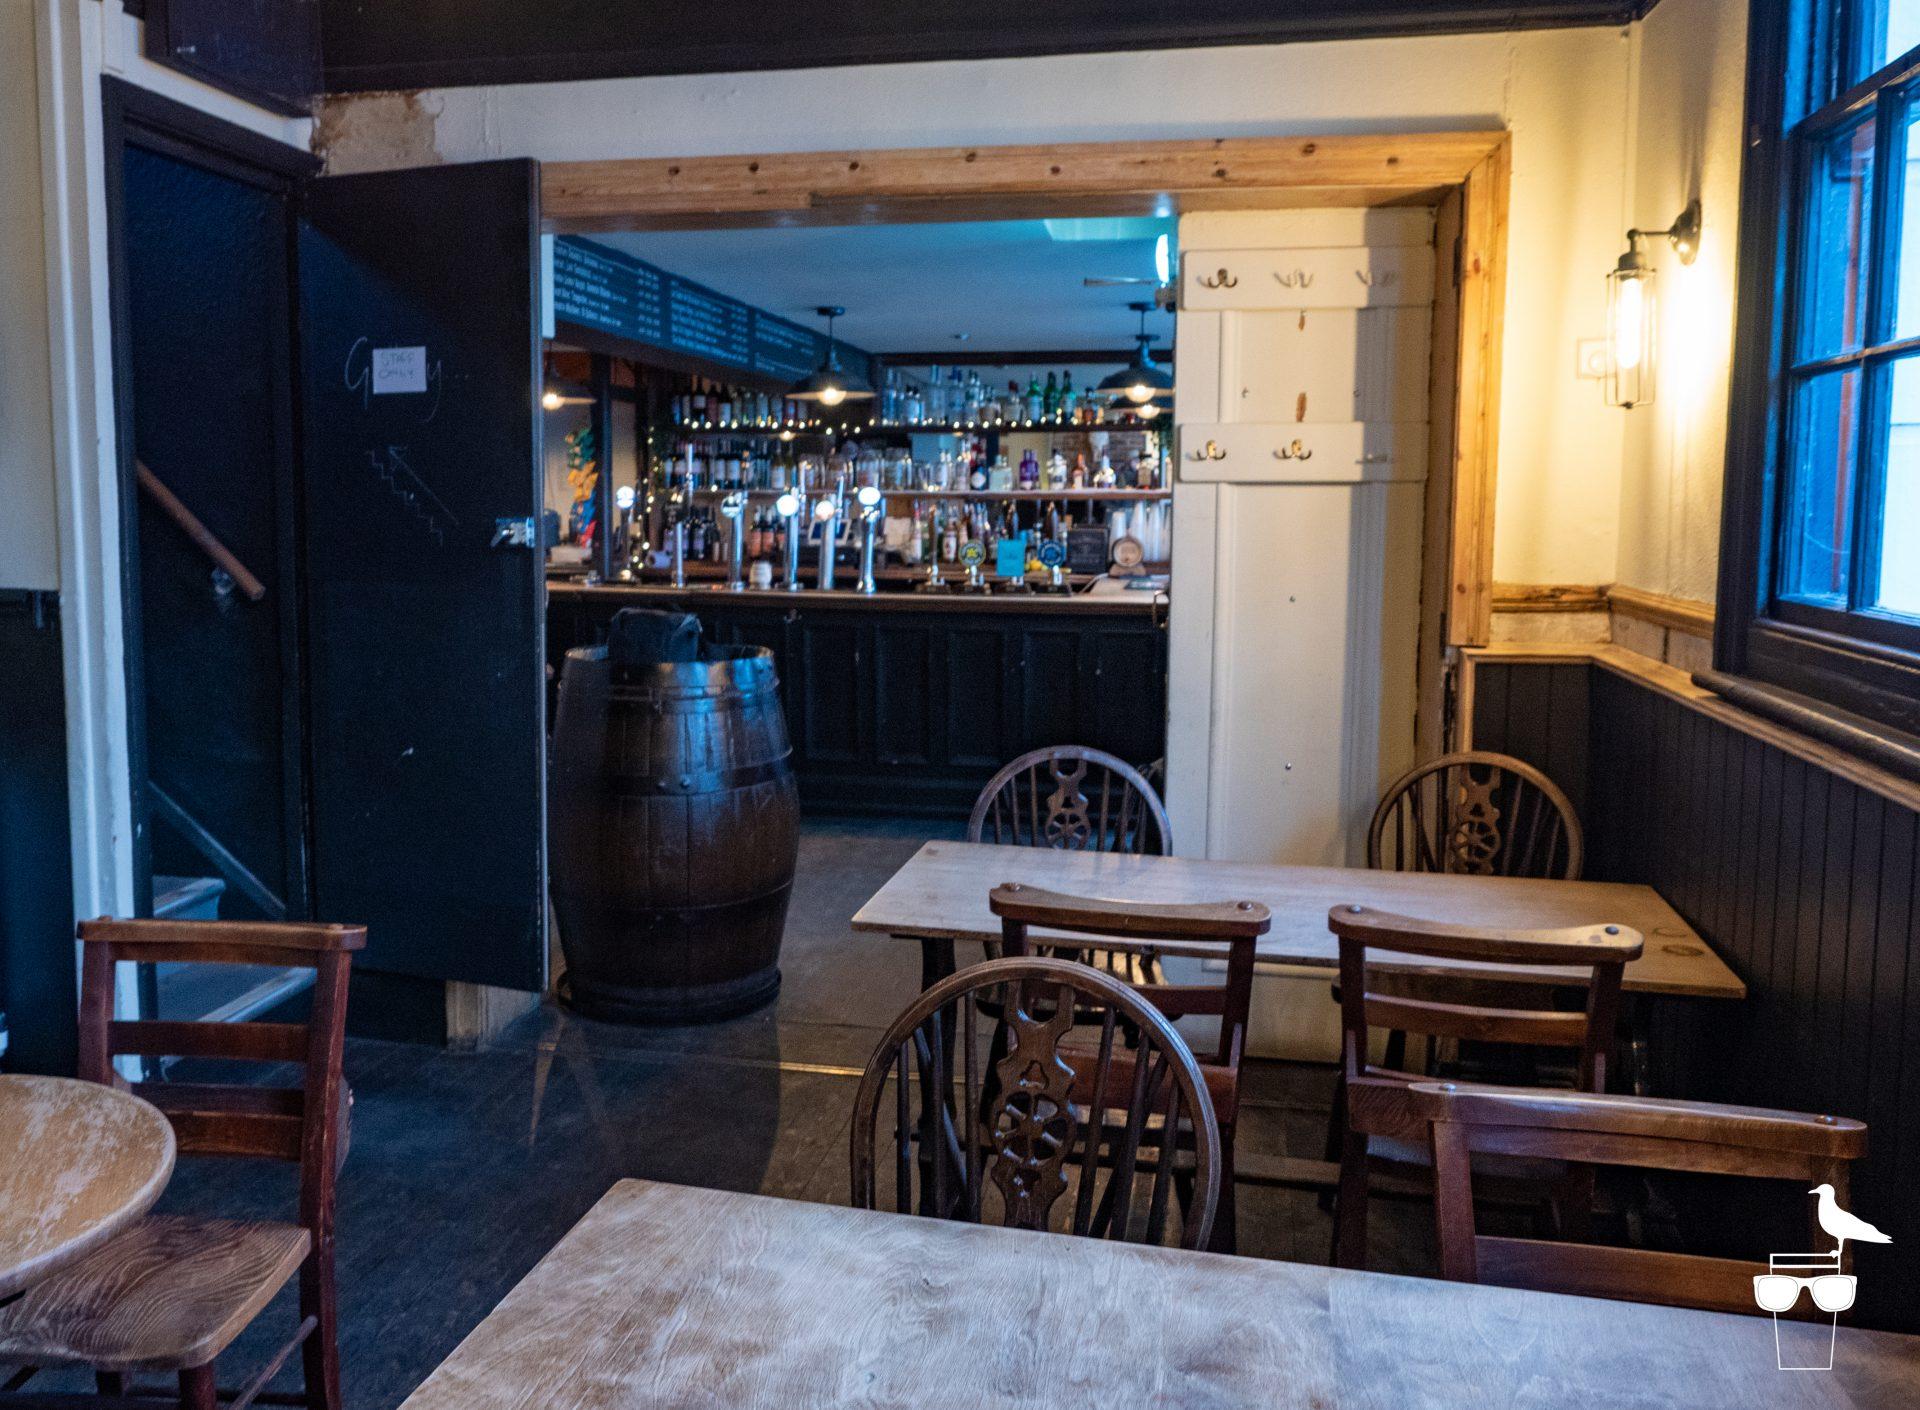 the foundry pub brighton inside view towards bar area